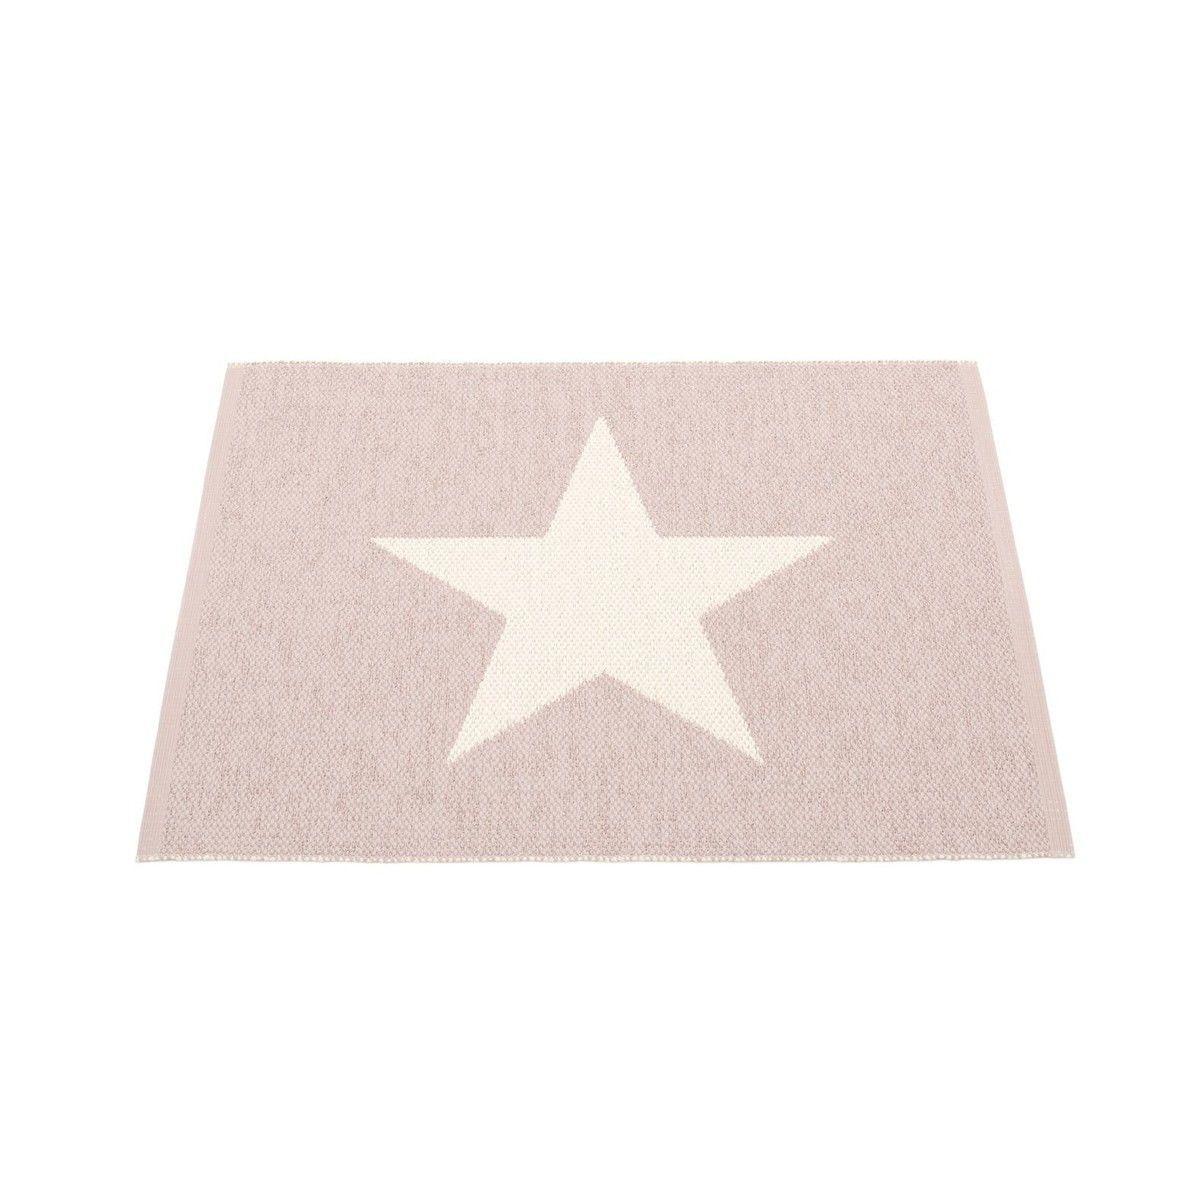 viggo small one teppich 70x90cm pappelina badvorleger teppiche textilien. Black Bedroom Furniture Sets. Home Design Ideas